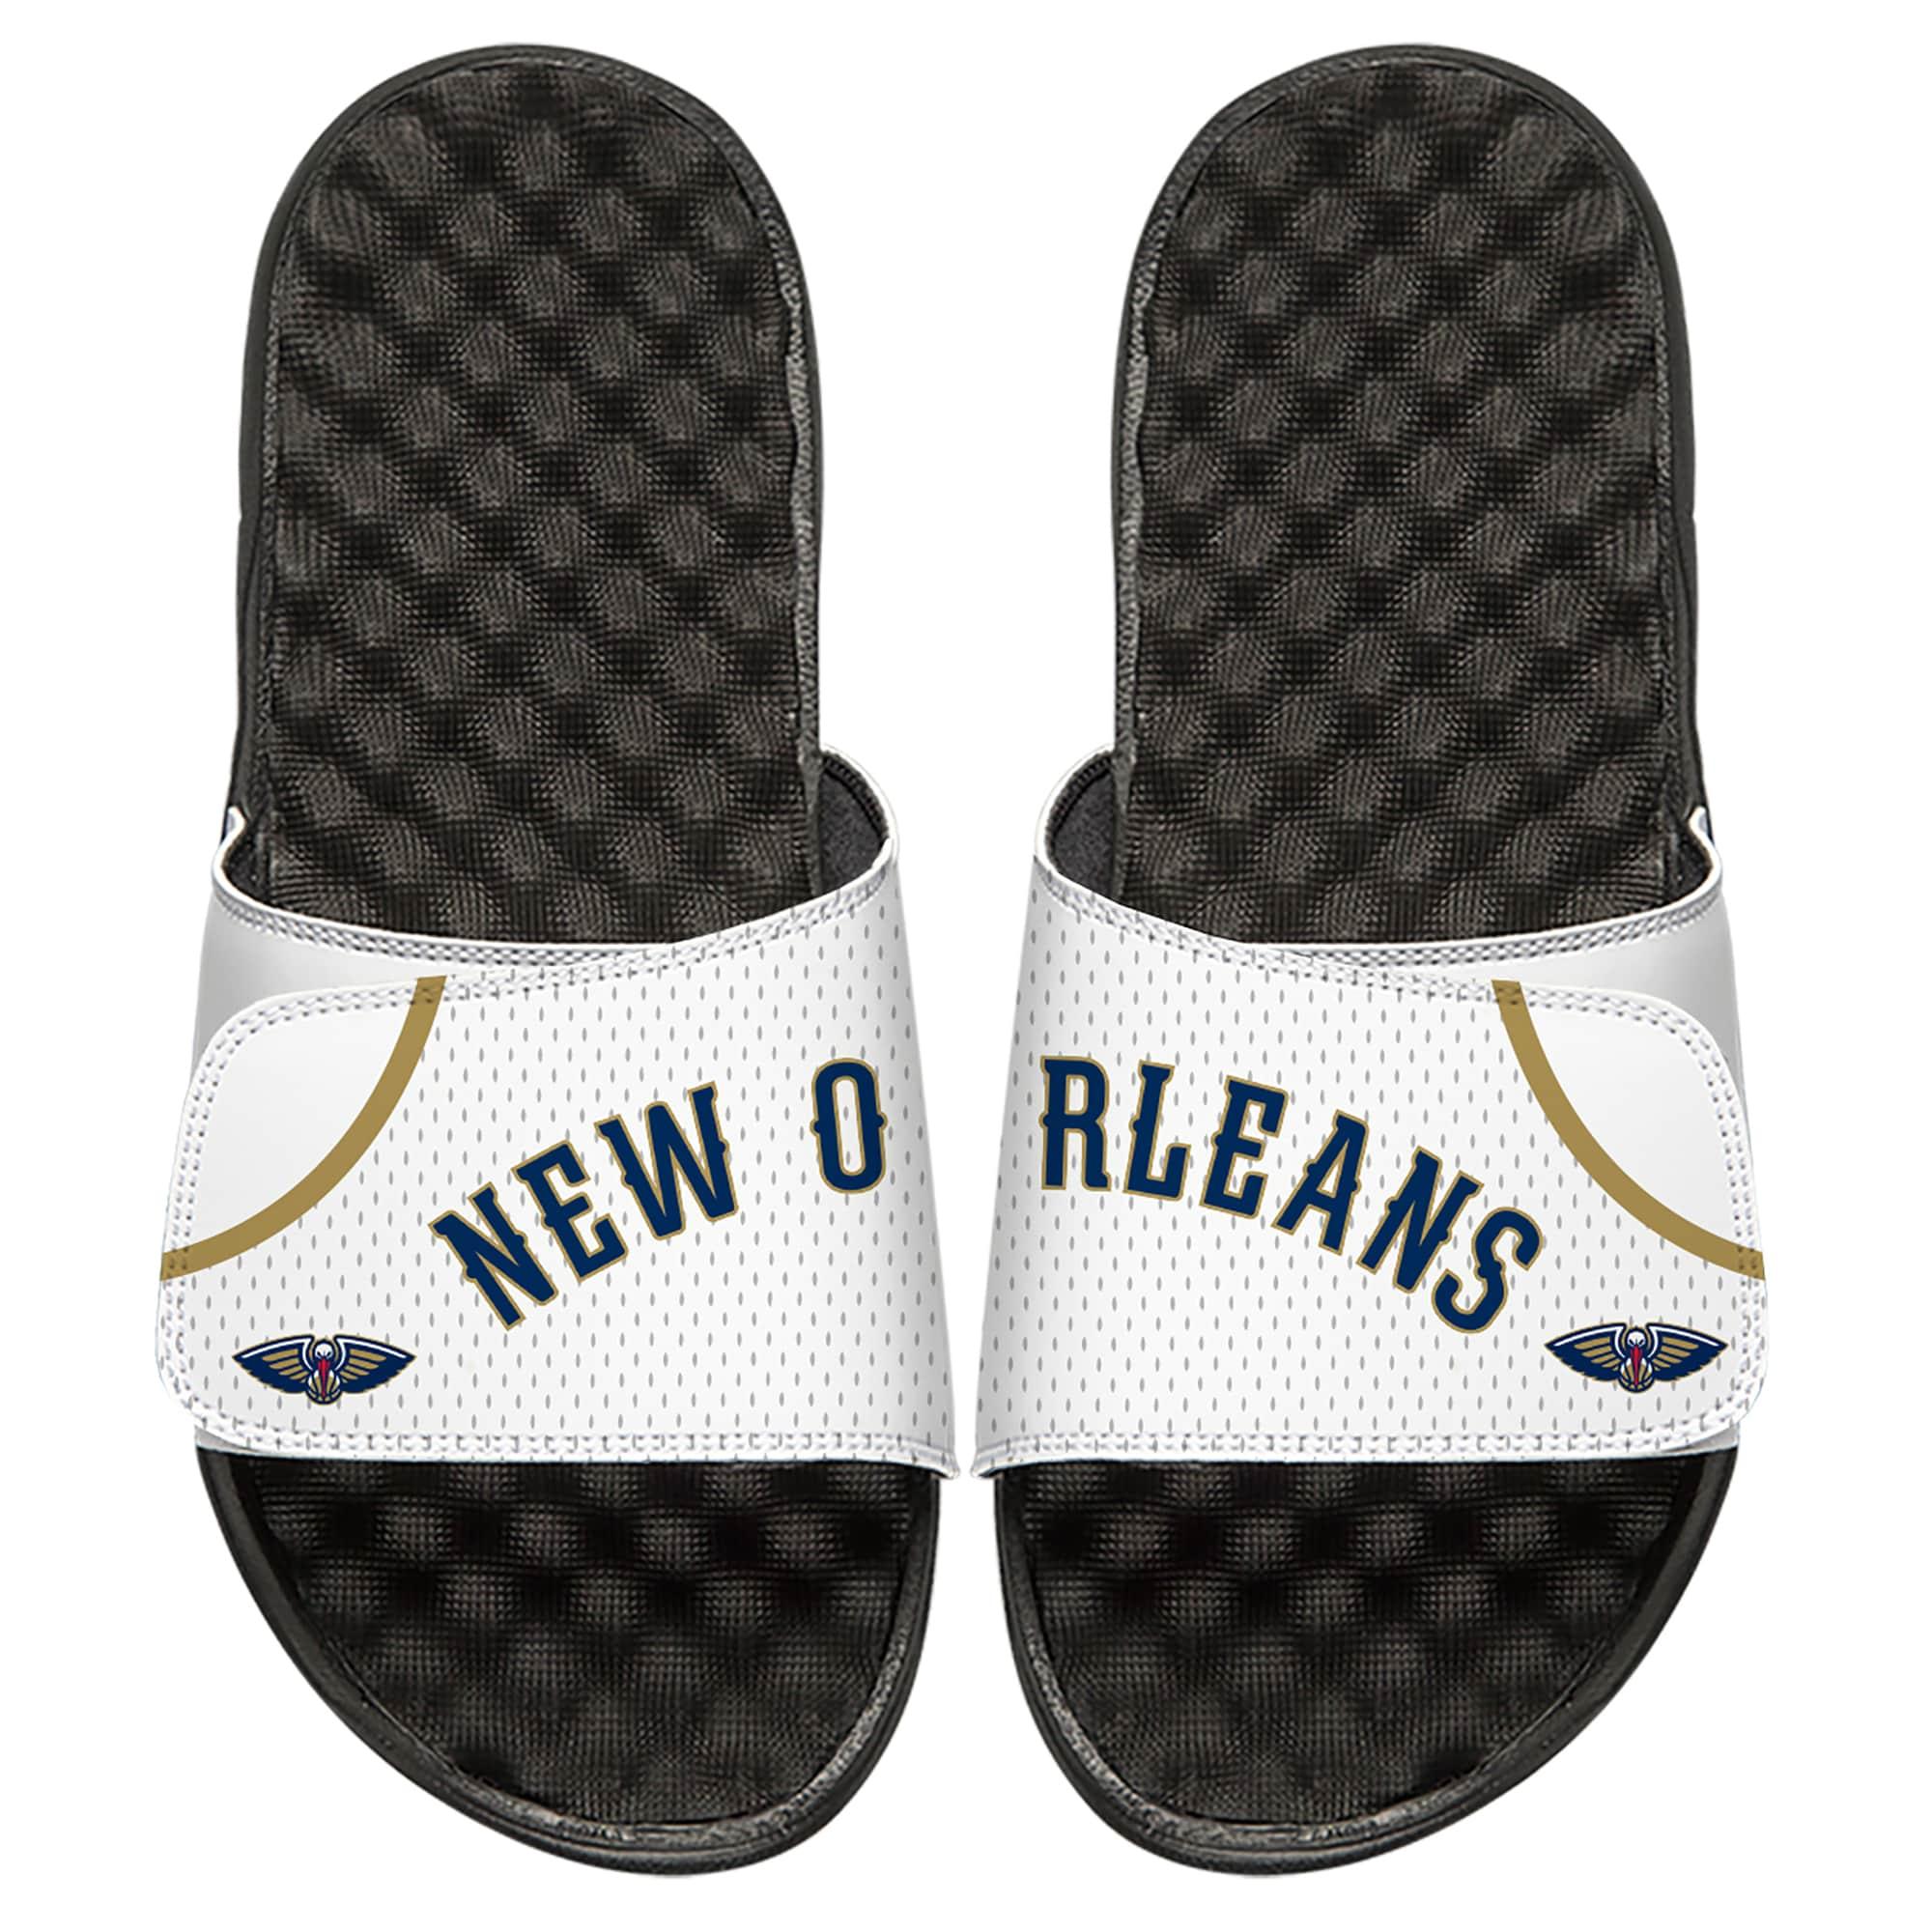 New Orleans Pelicans ISlide Home Jersey Split Slide Sandals - White